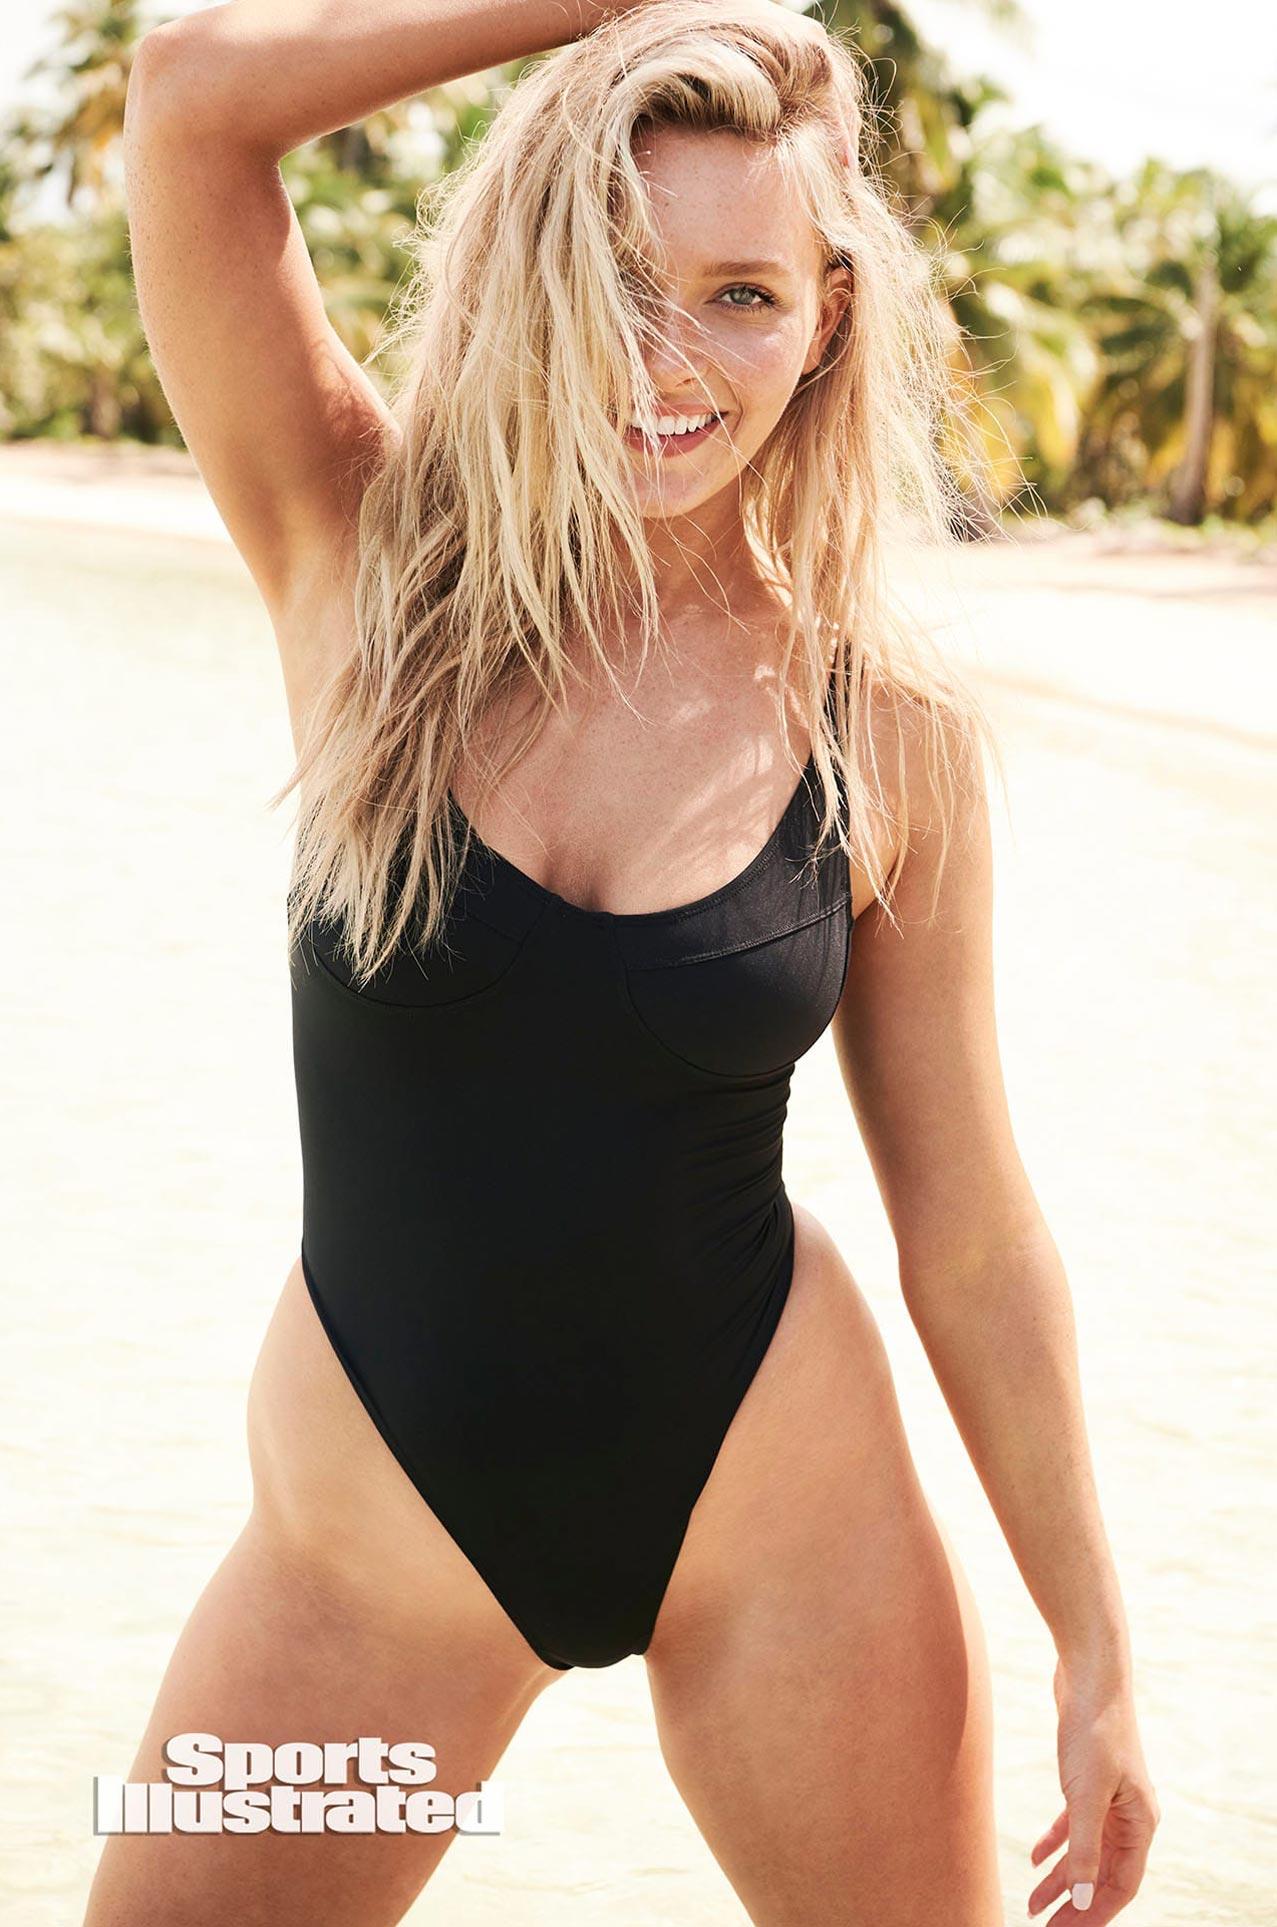 Камилла Костек в каталоге купальников Sports Illustrated Swimsuit 2020 / фото 09